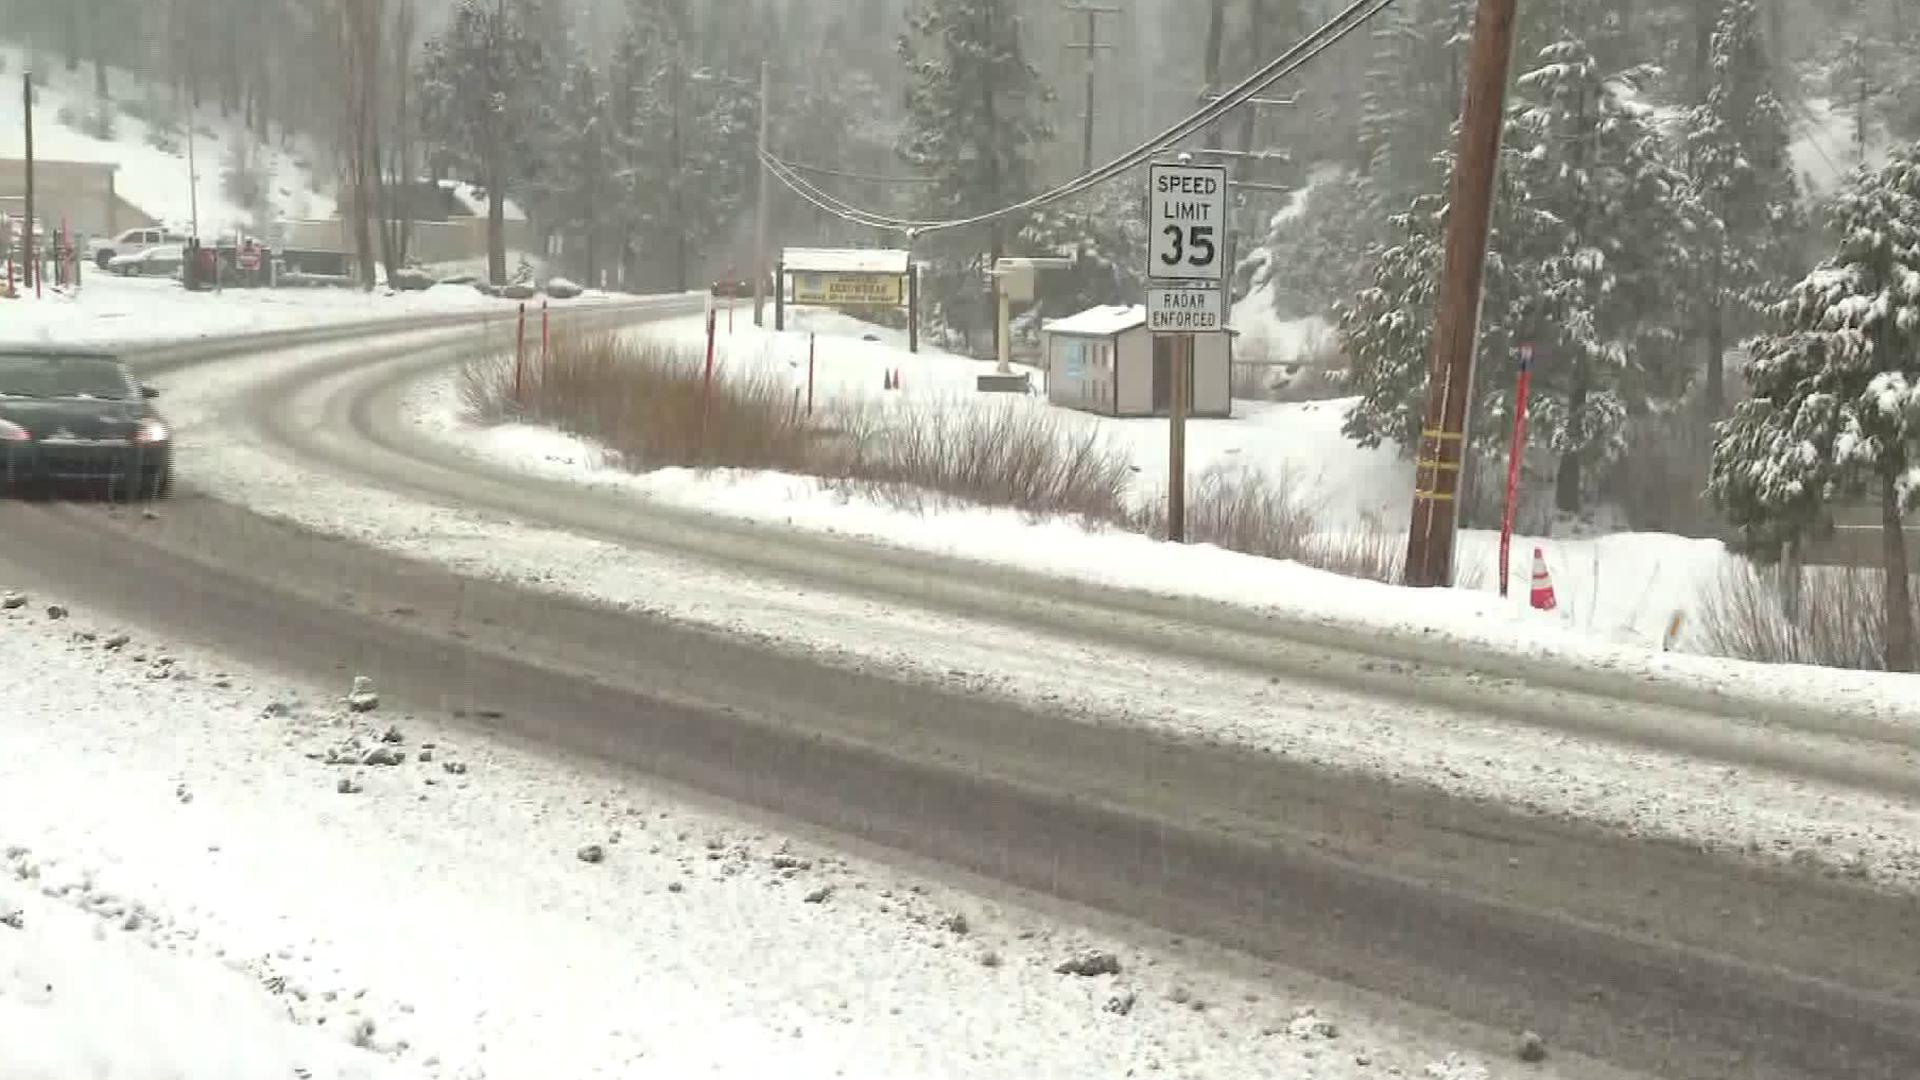 Snow is seen in Running Springs on March 21, 2019. (Credit: KTLA)